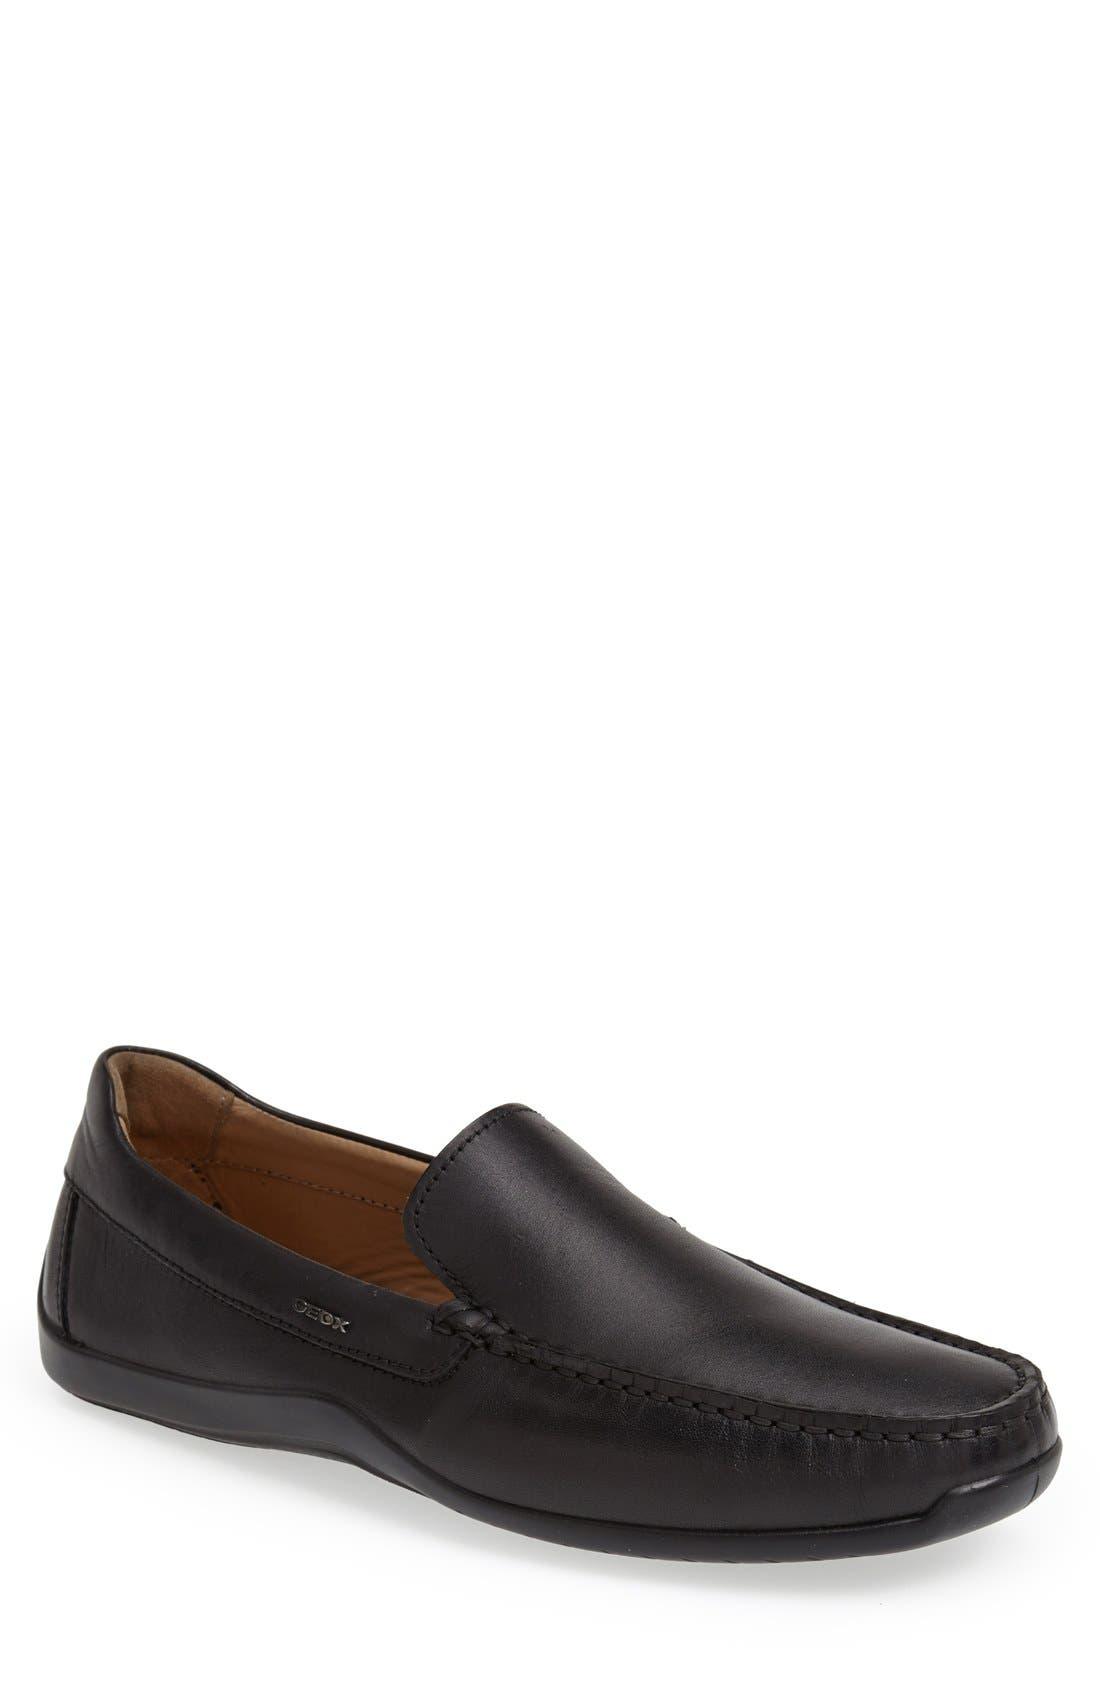 Alternate Image 1 Selected - Geox 'U Xense Mox' Driving Shoe (Men)